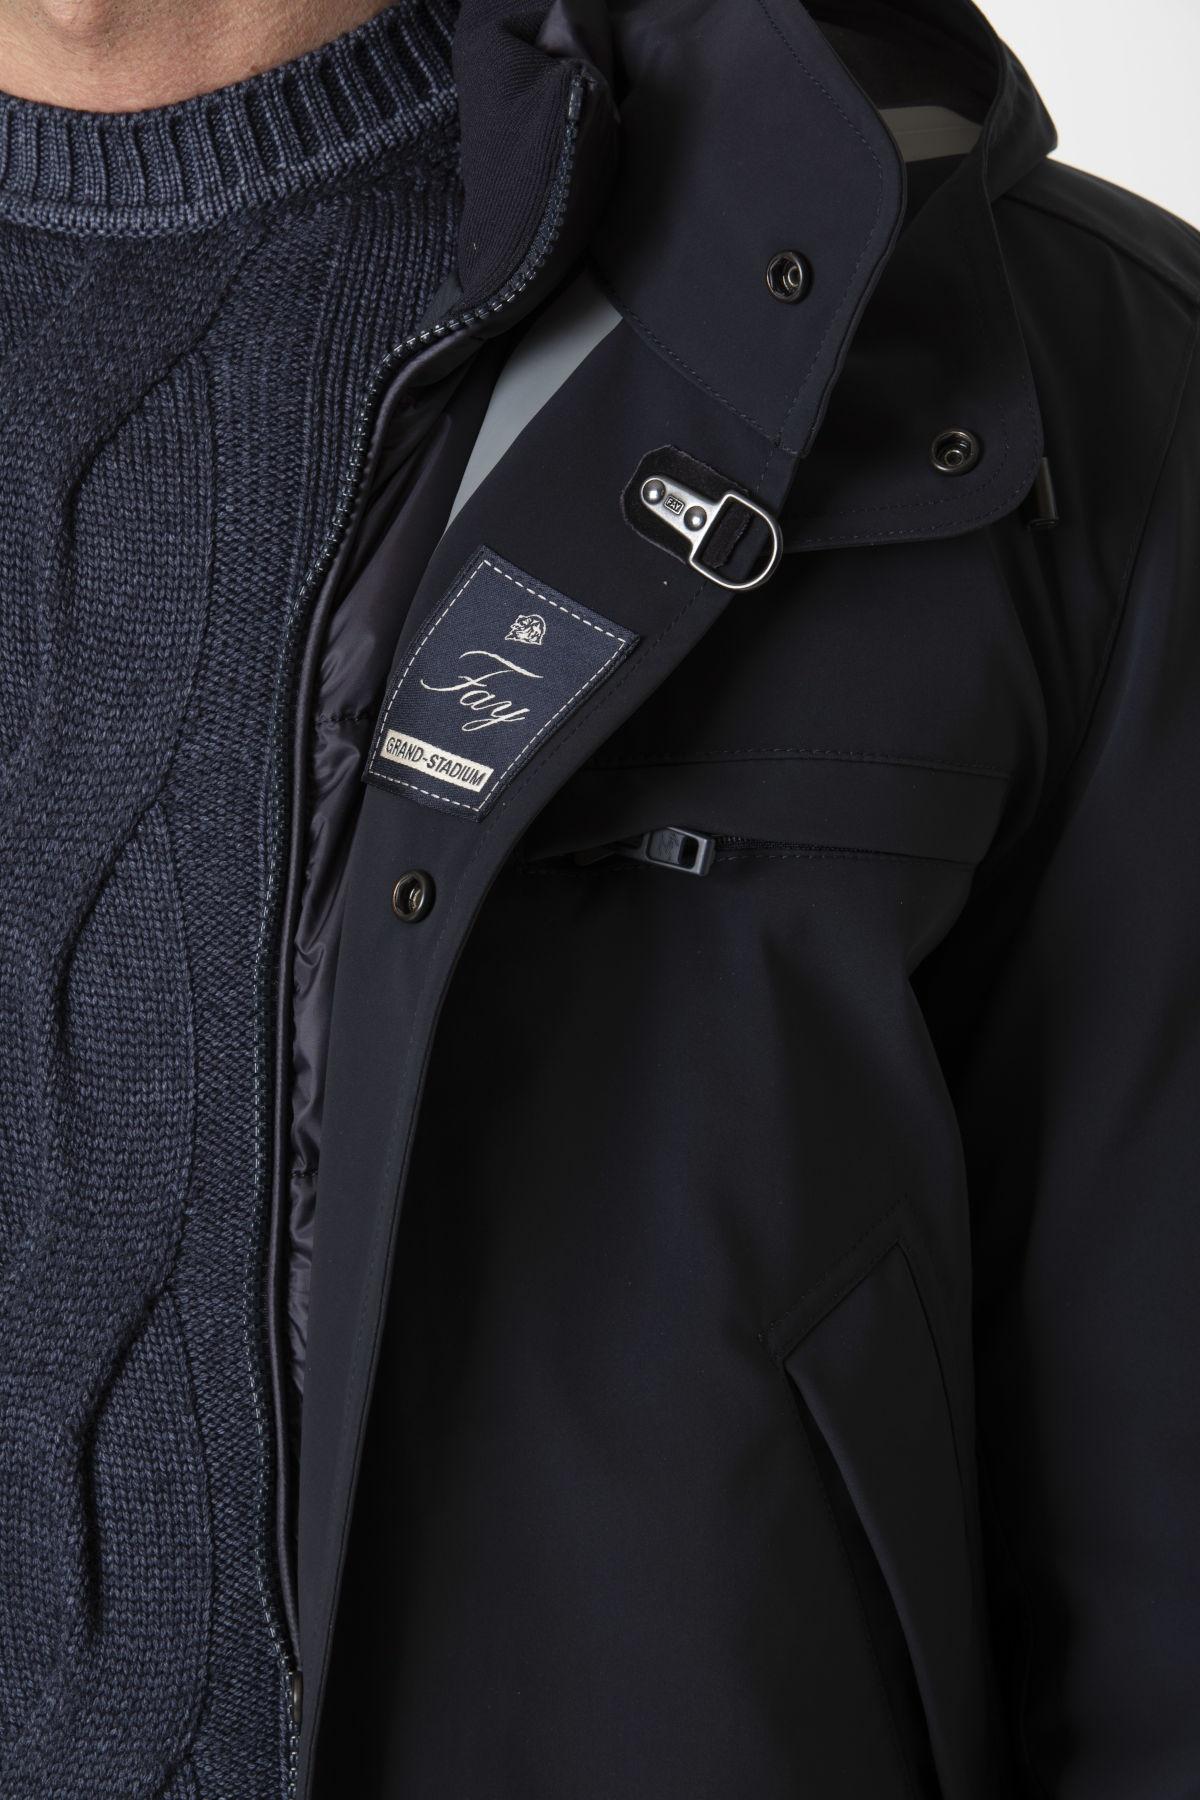 GRAND STADIUM Jacket for man FAY F/W 19-20